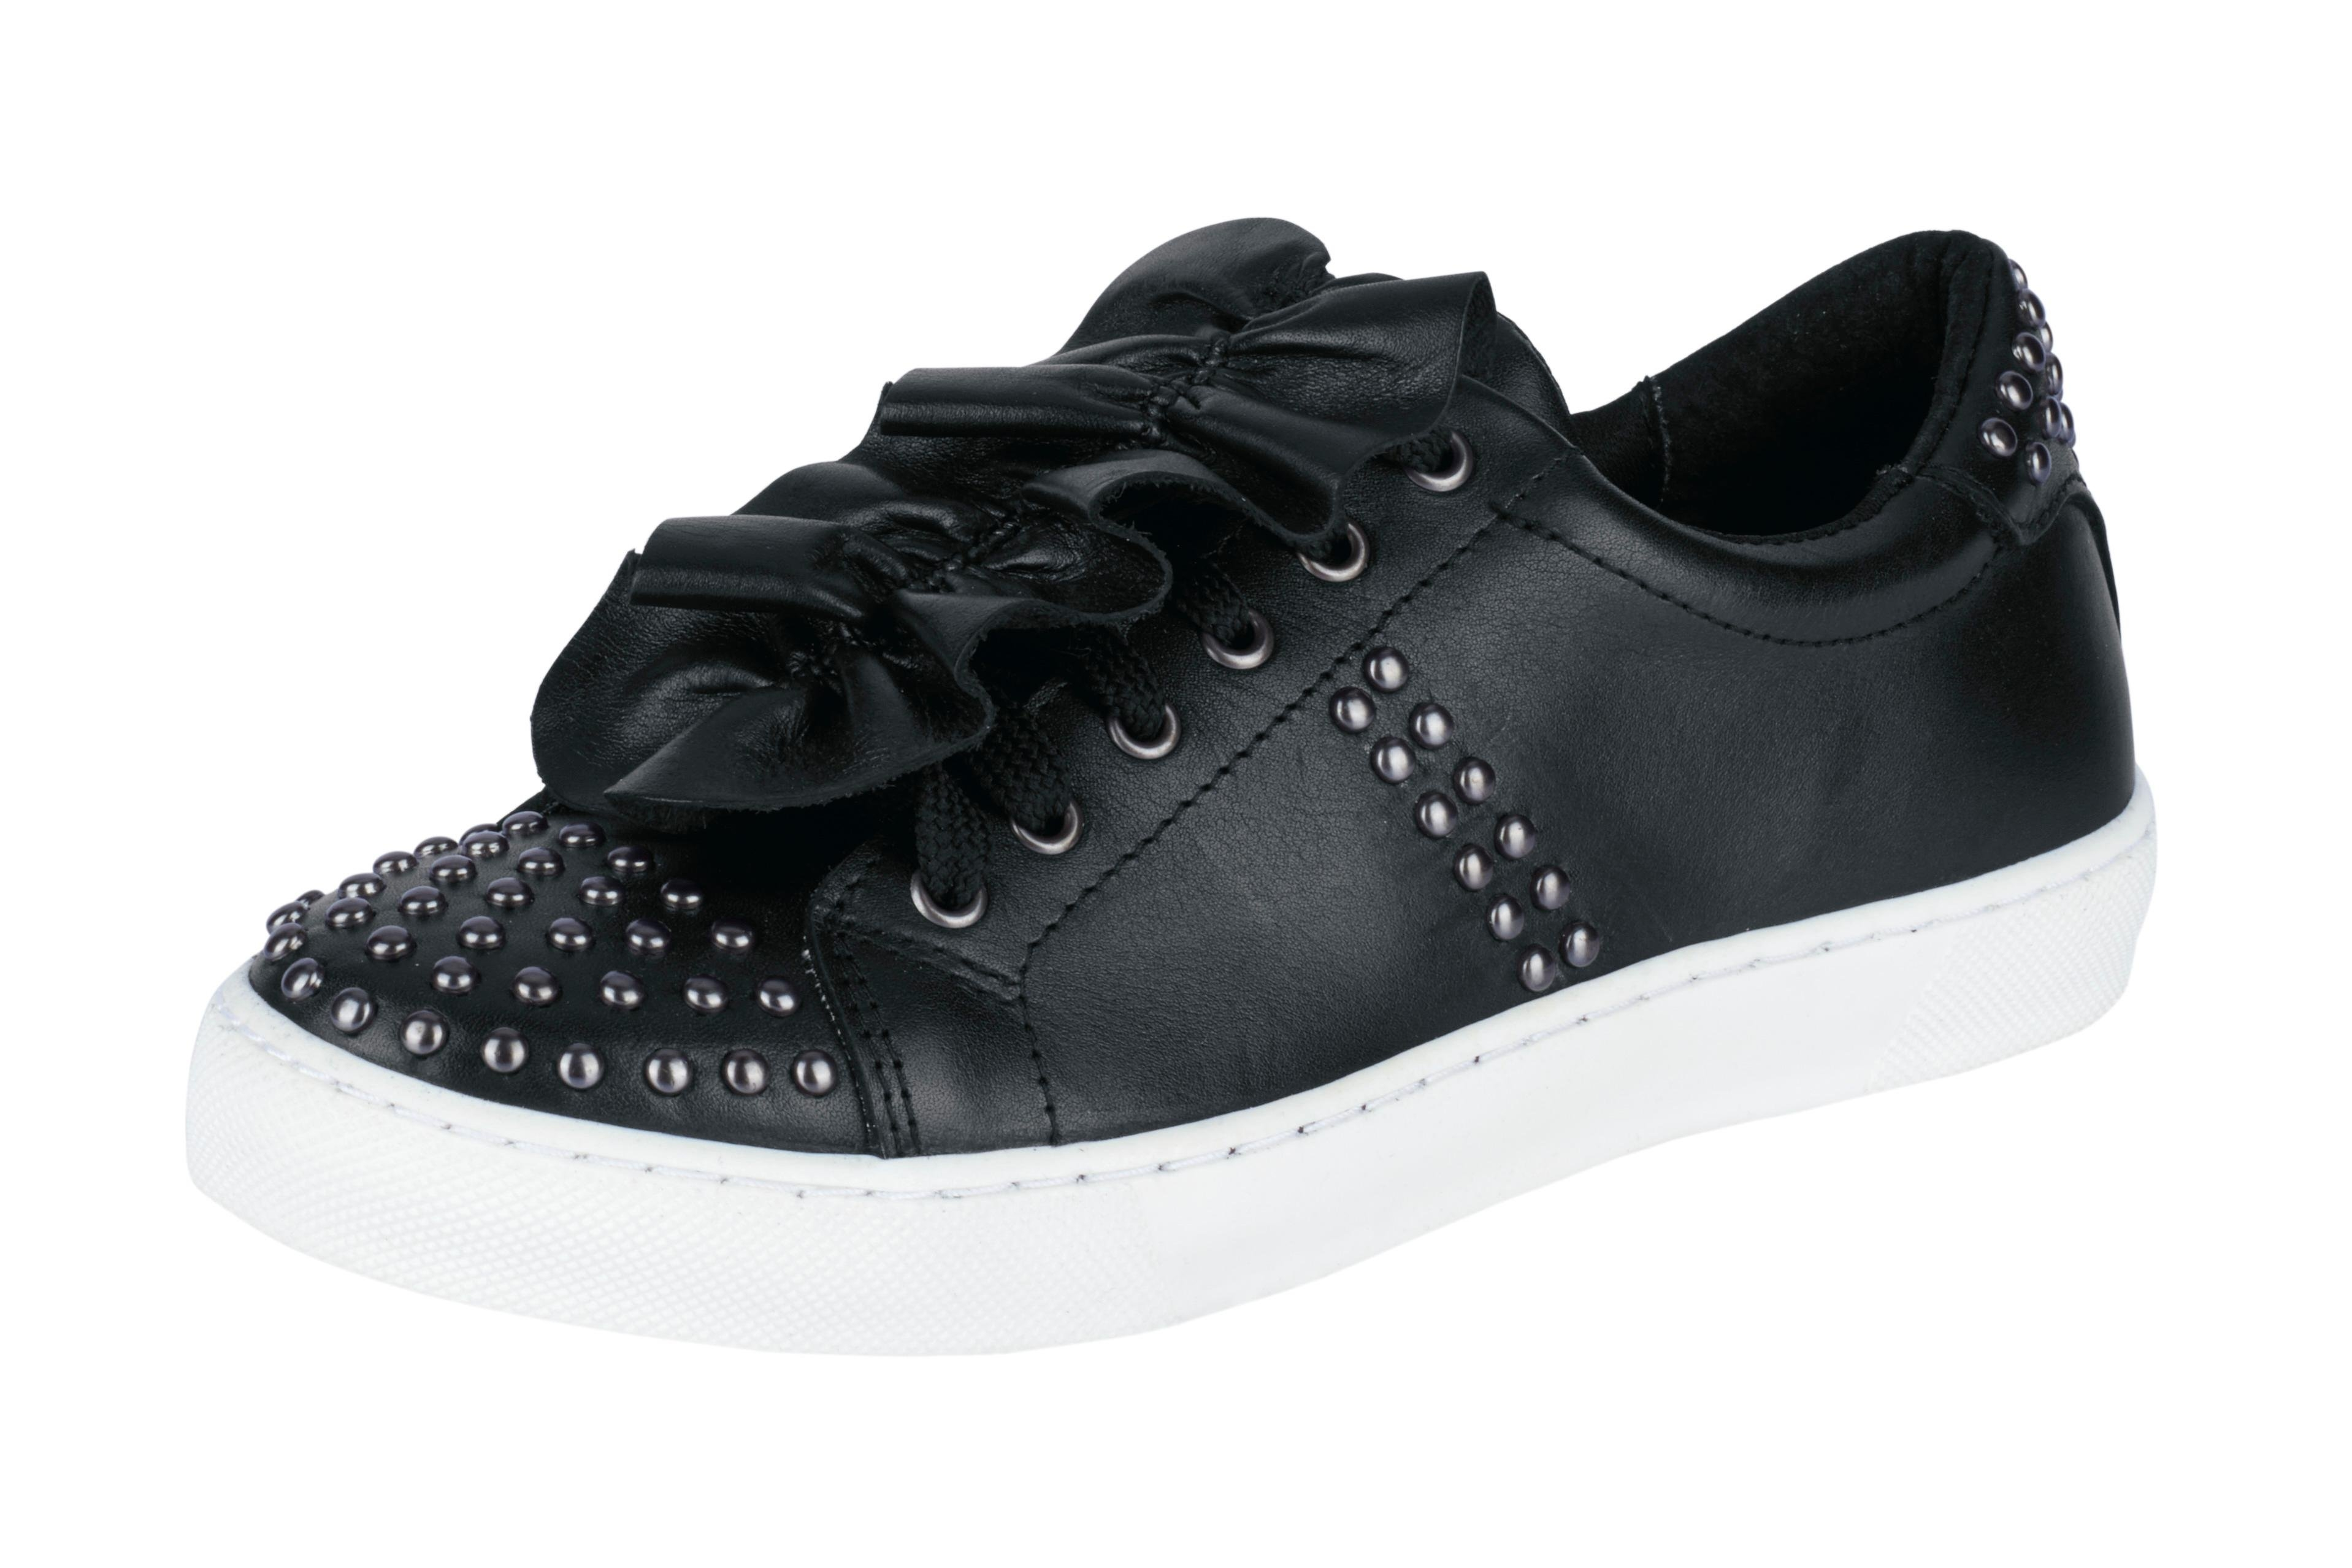 Online Online Online Shoppen Sneakers Sneakers Shoppen Shoppen Sneakers 4RL5Aj